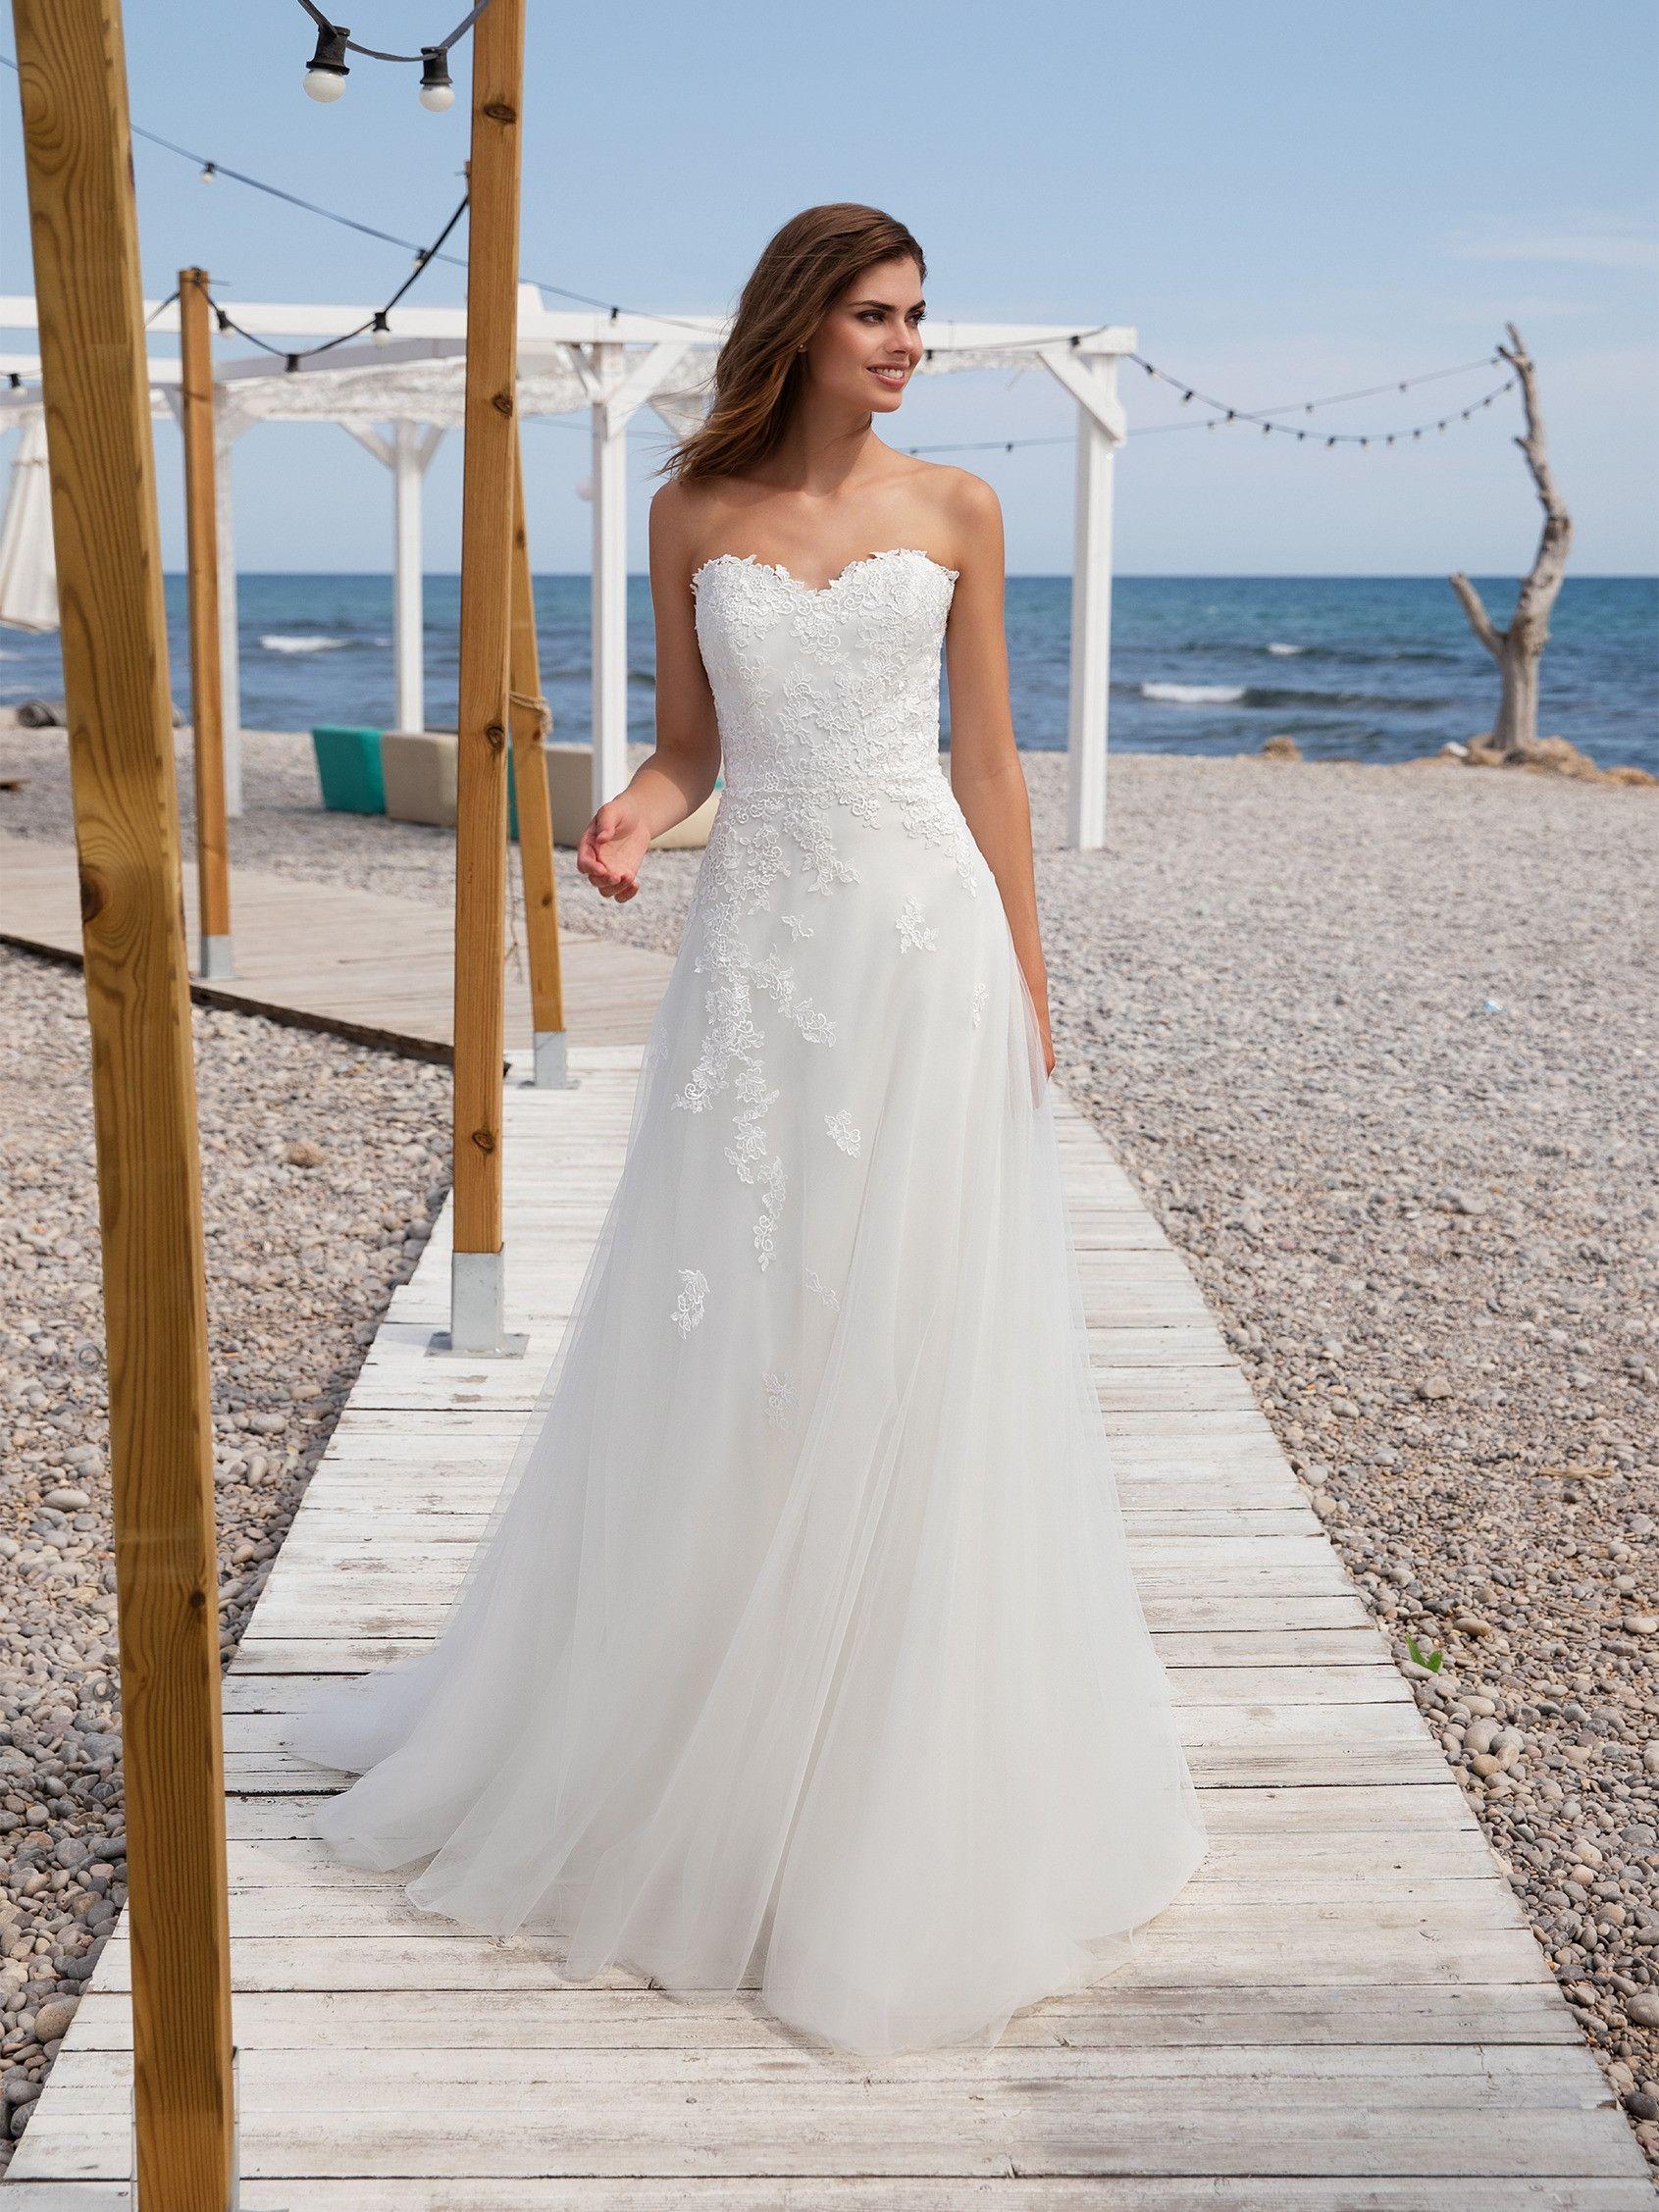 Chilly Fall Kelowna Elopement Chiffon Wedding Gowns Long Beach Wedding Dresses Long Bridal Gown